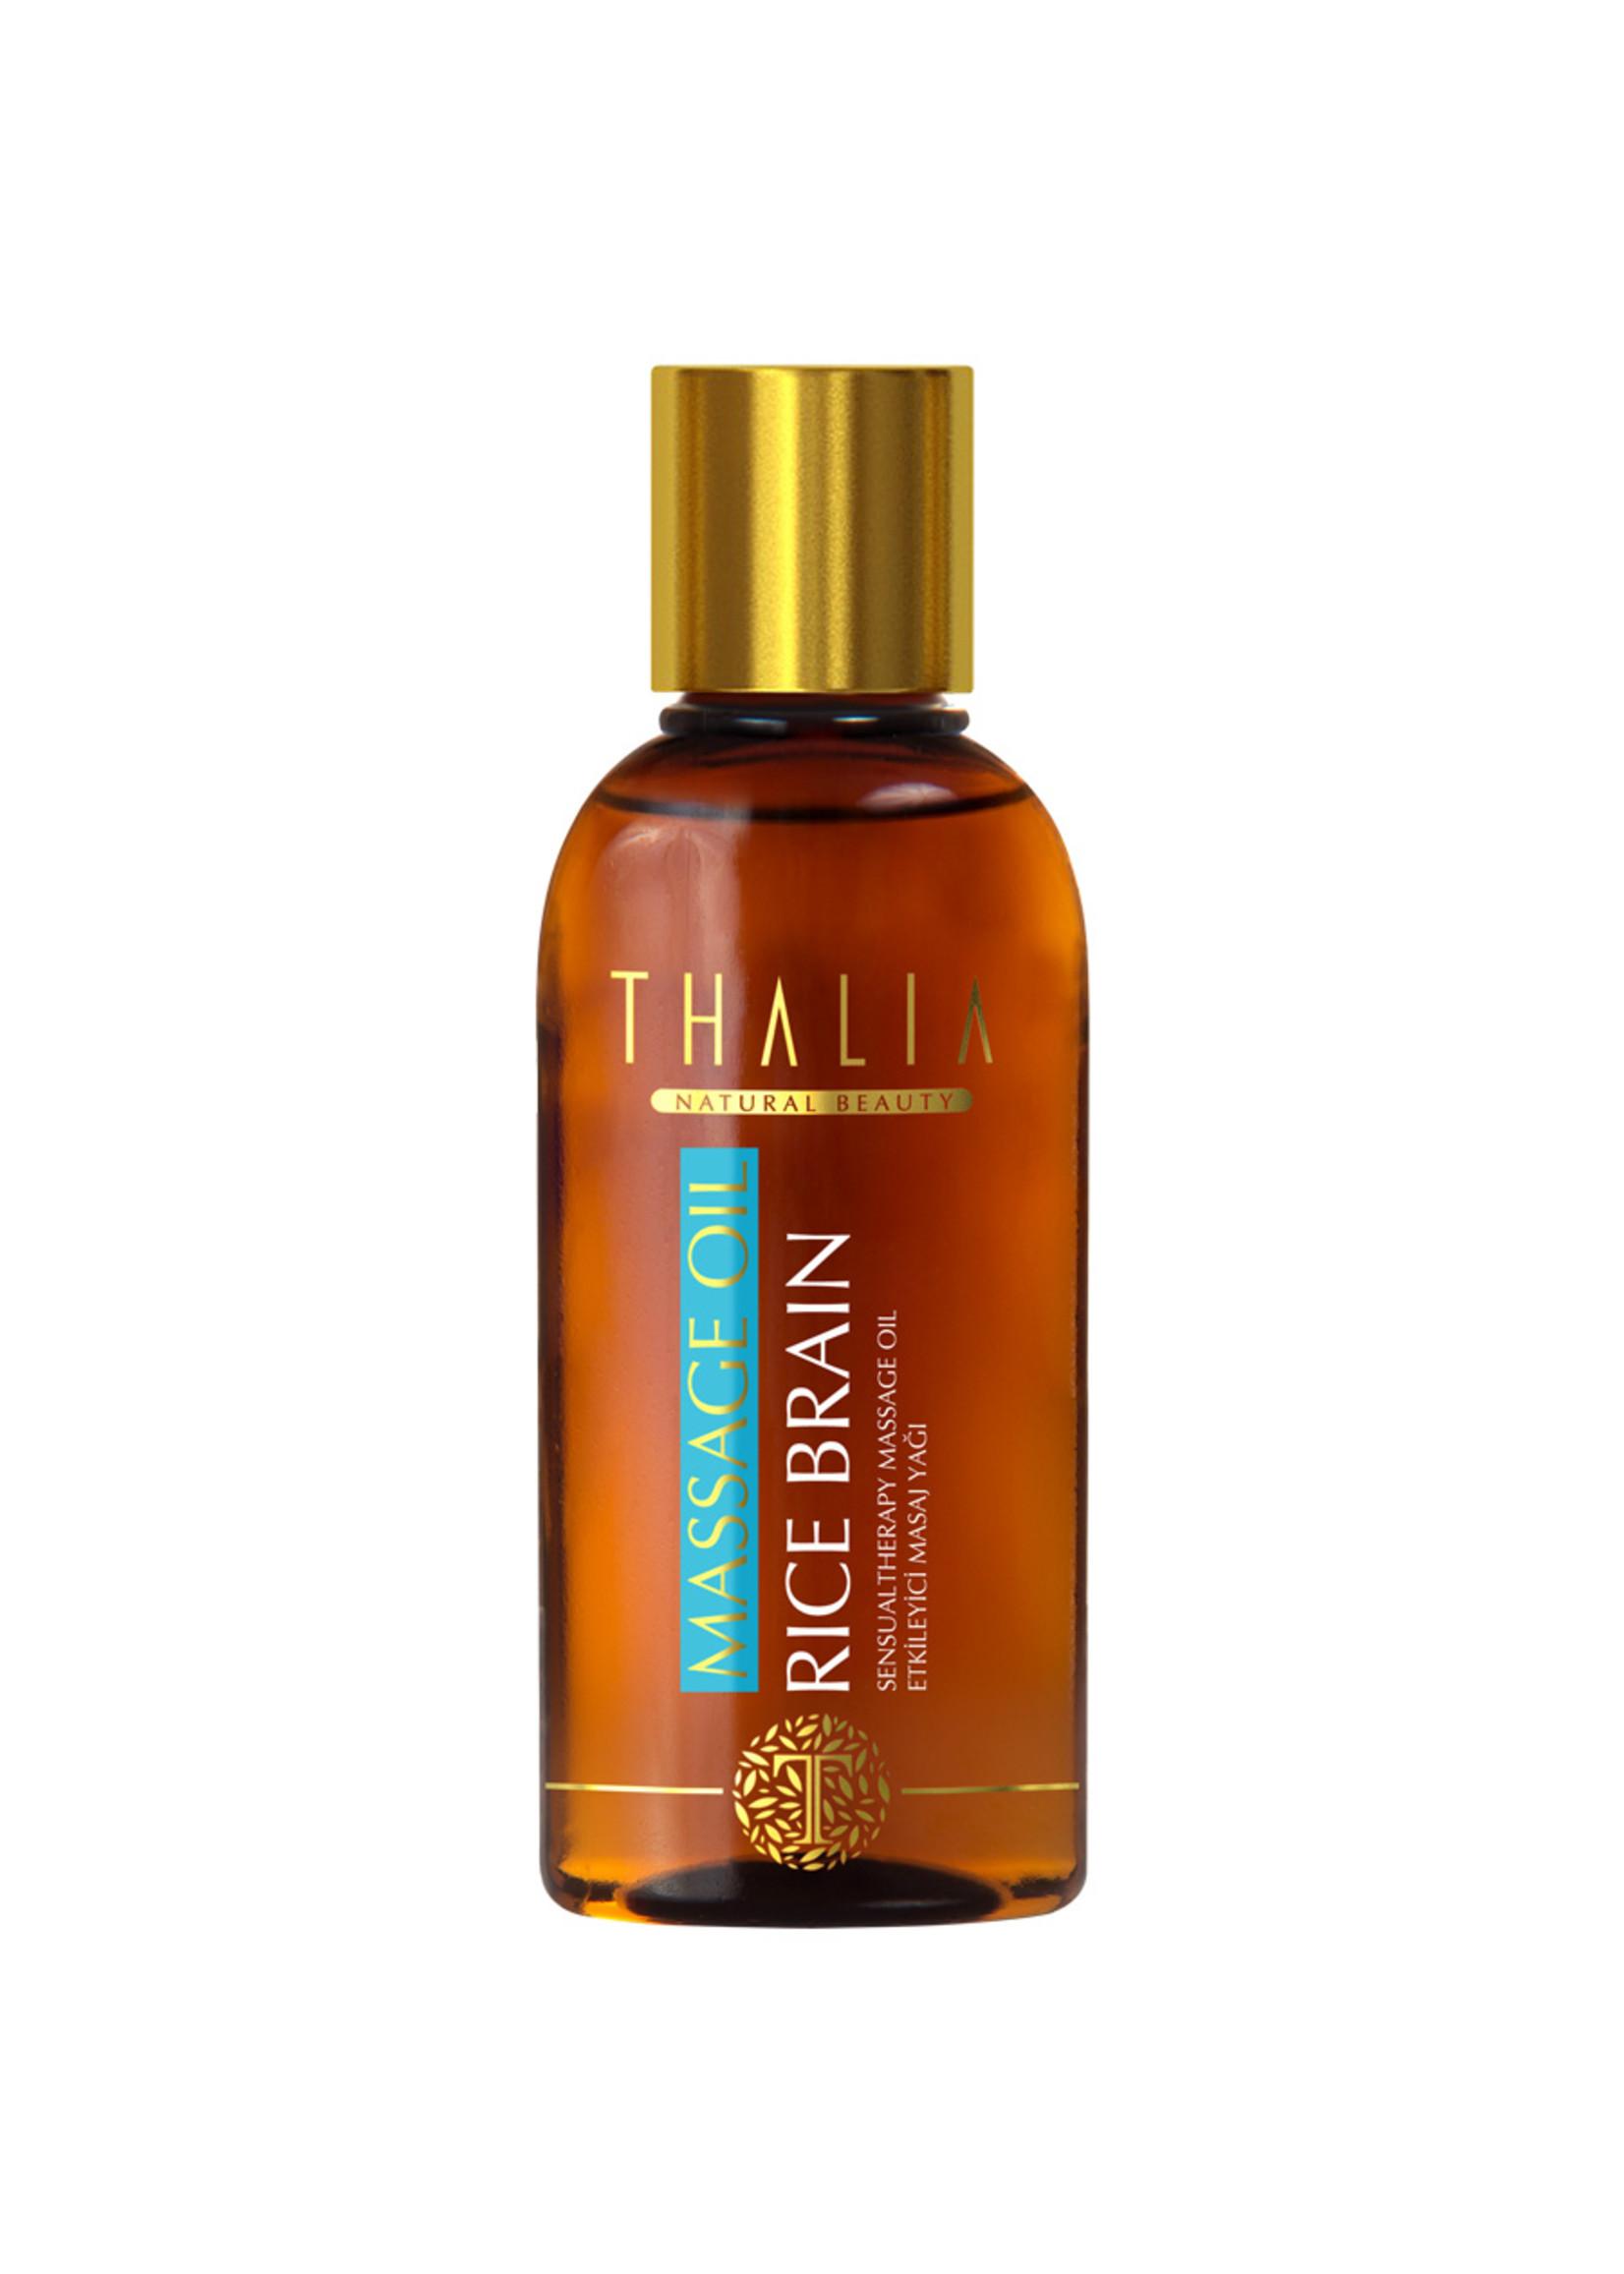 Thalia Rijst Zemelen Massage Olie 150 ml